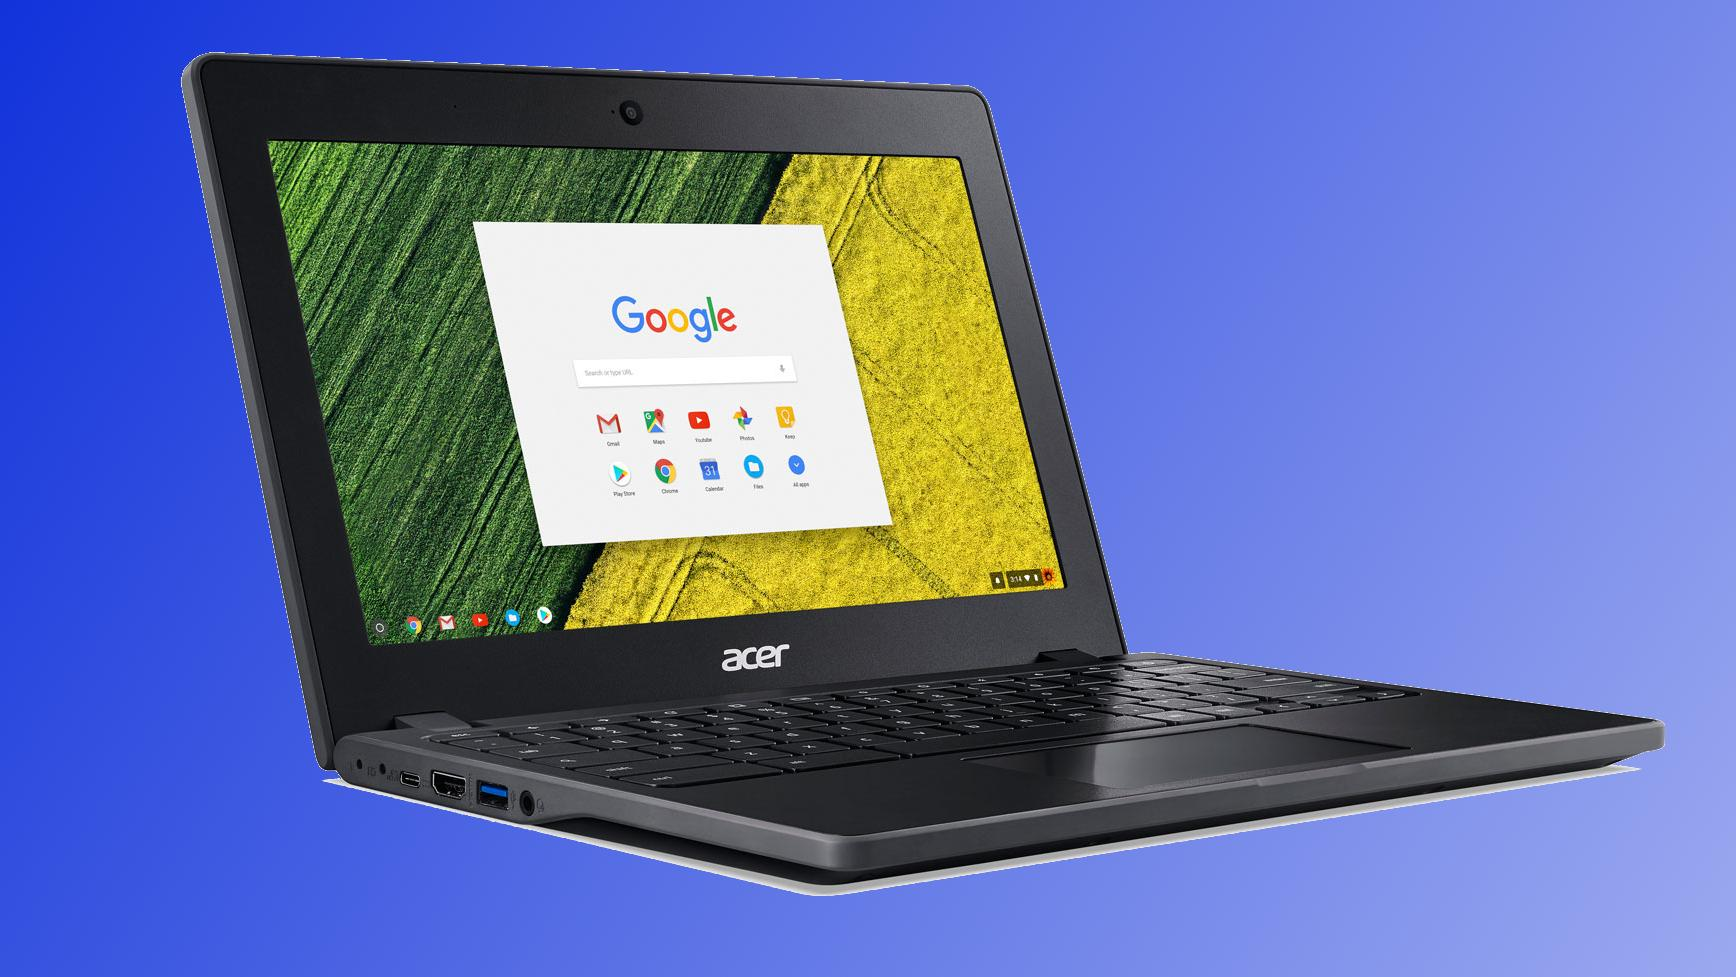 Acers nye Chromebook kan du trygt miste på bakken